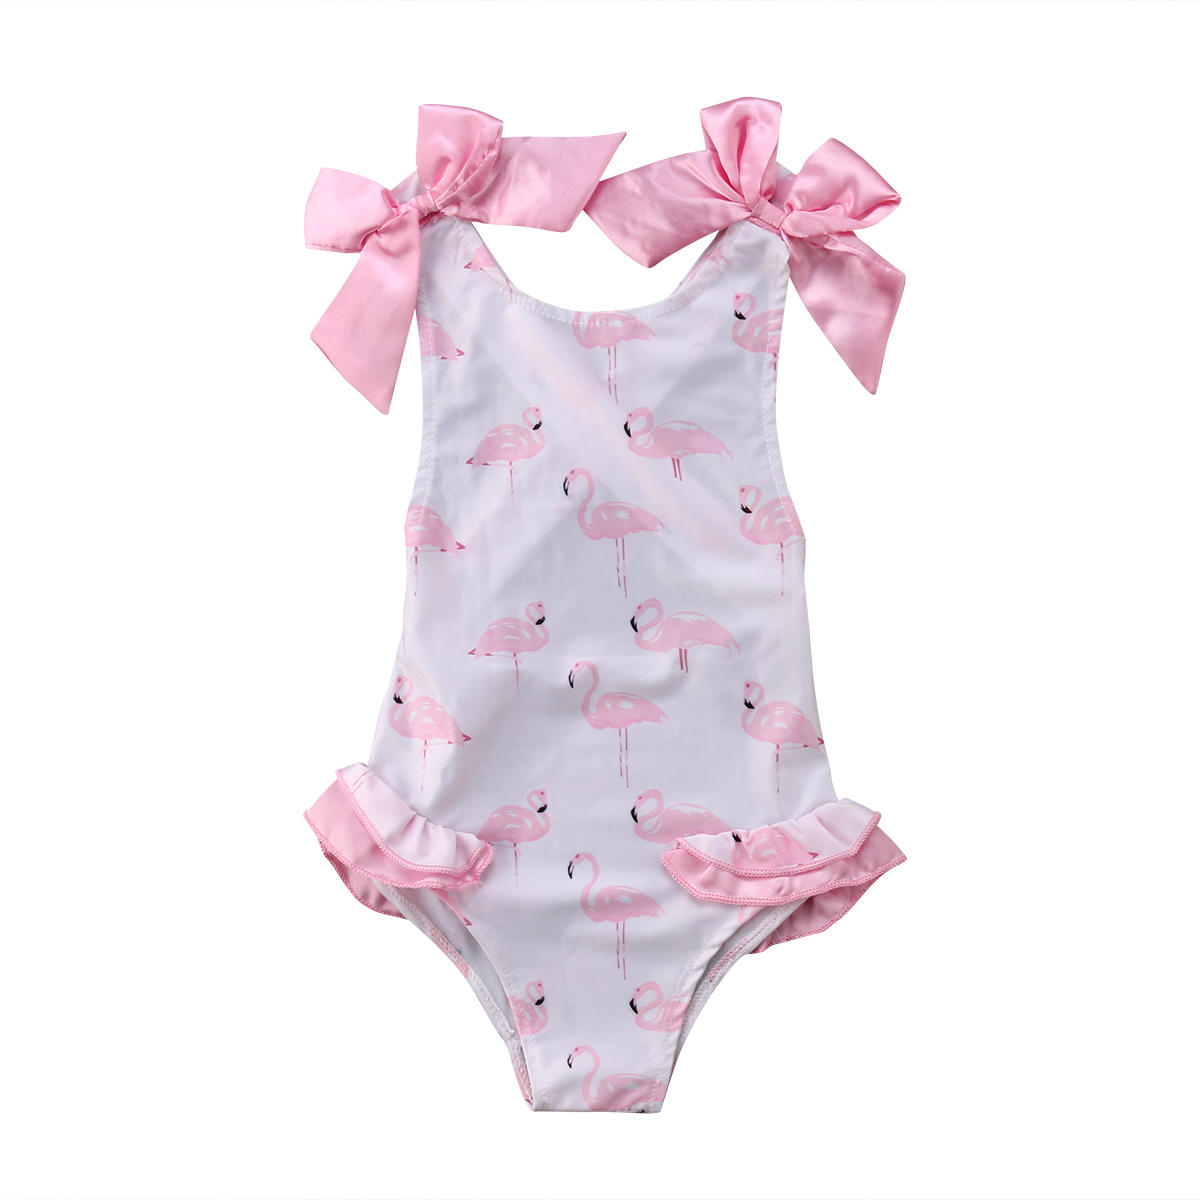 Luggage & Bags 2018 Family Toddler Baby Kid Girl Bikini Matching Unicorn Bodysuit Set Bathing Suit Swimwear Swimsuit Beachwear